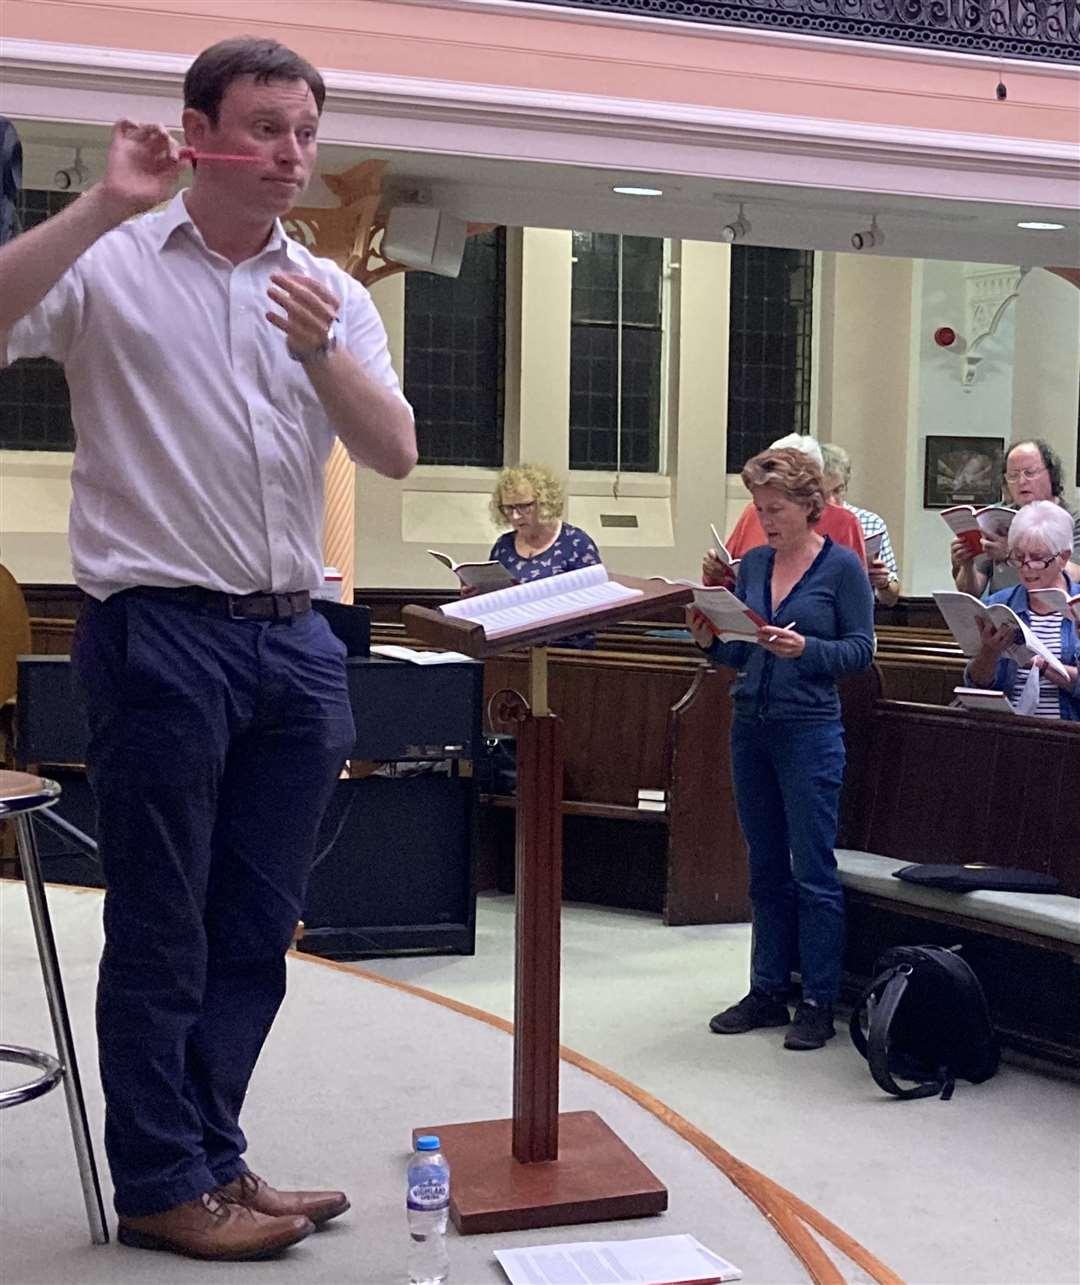 Bishop's Stortford Choral Society musical director Richard Brain